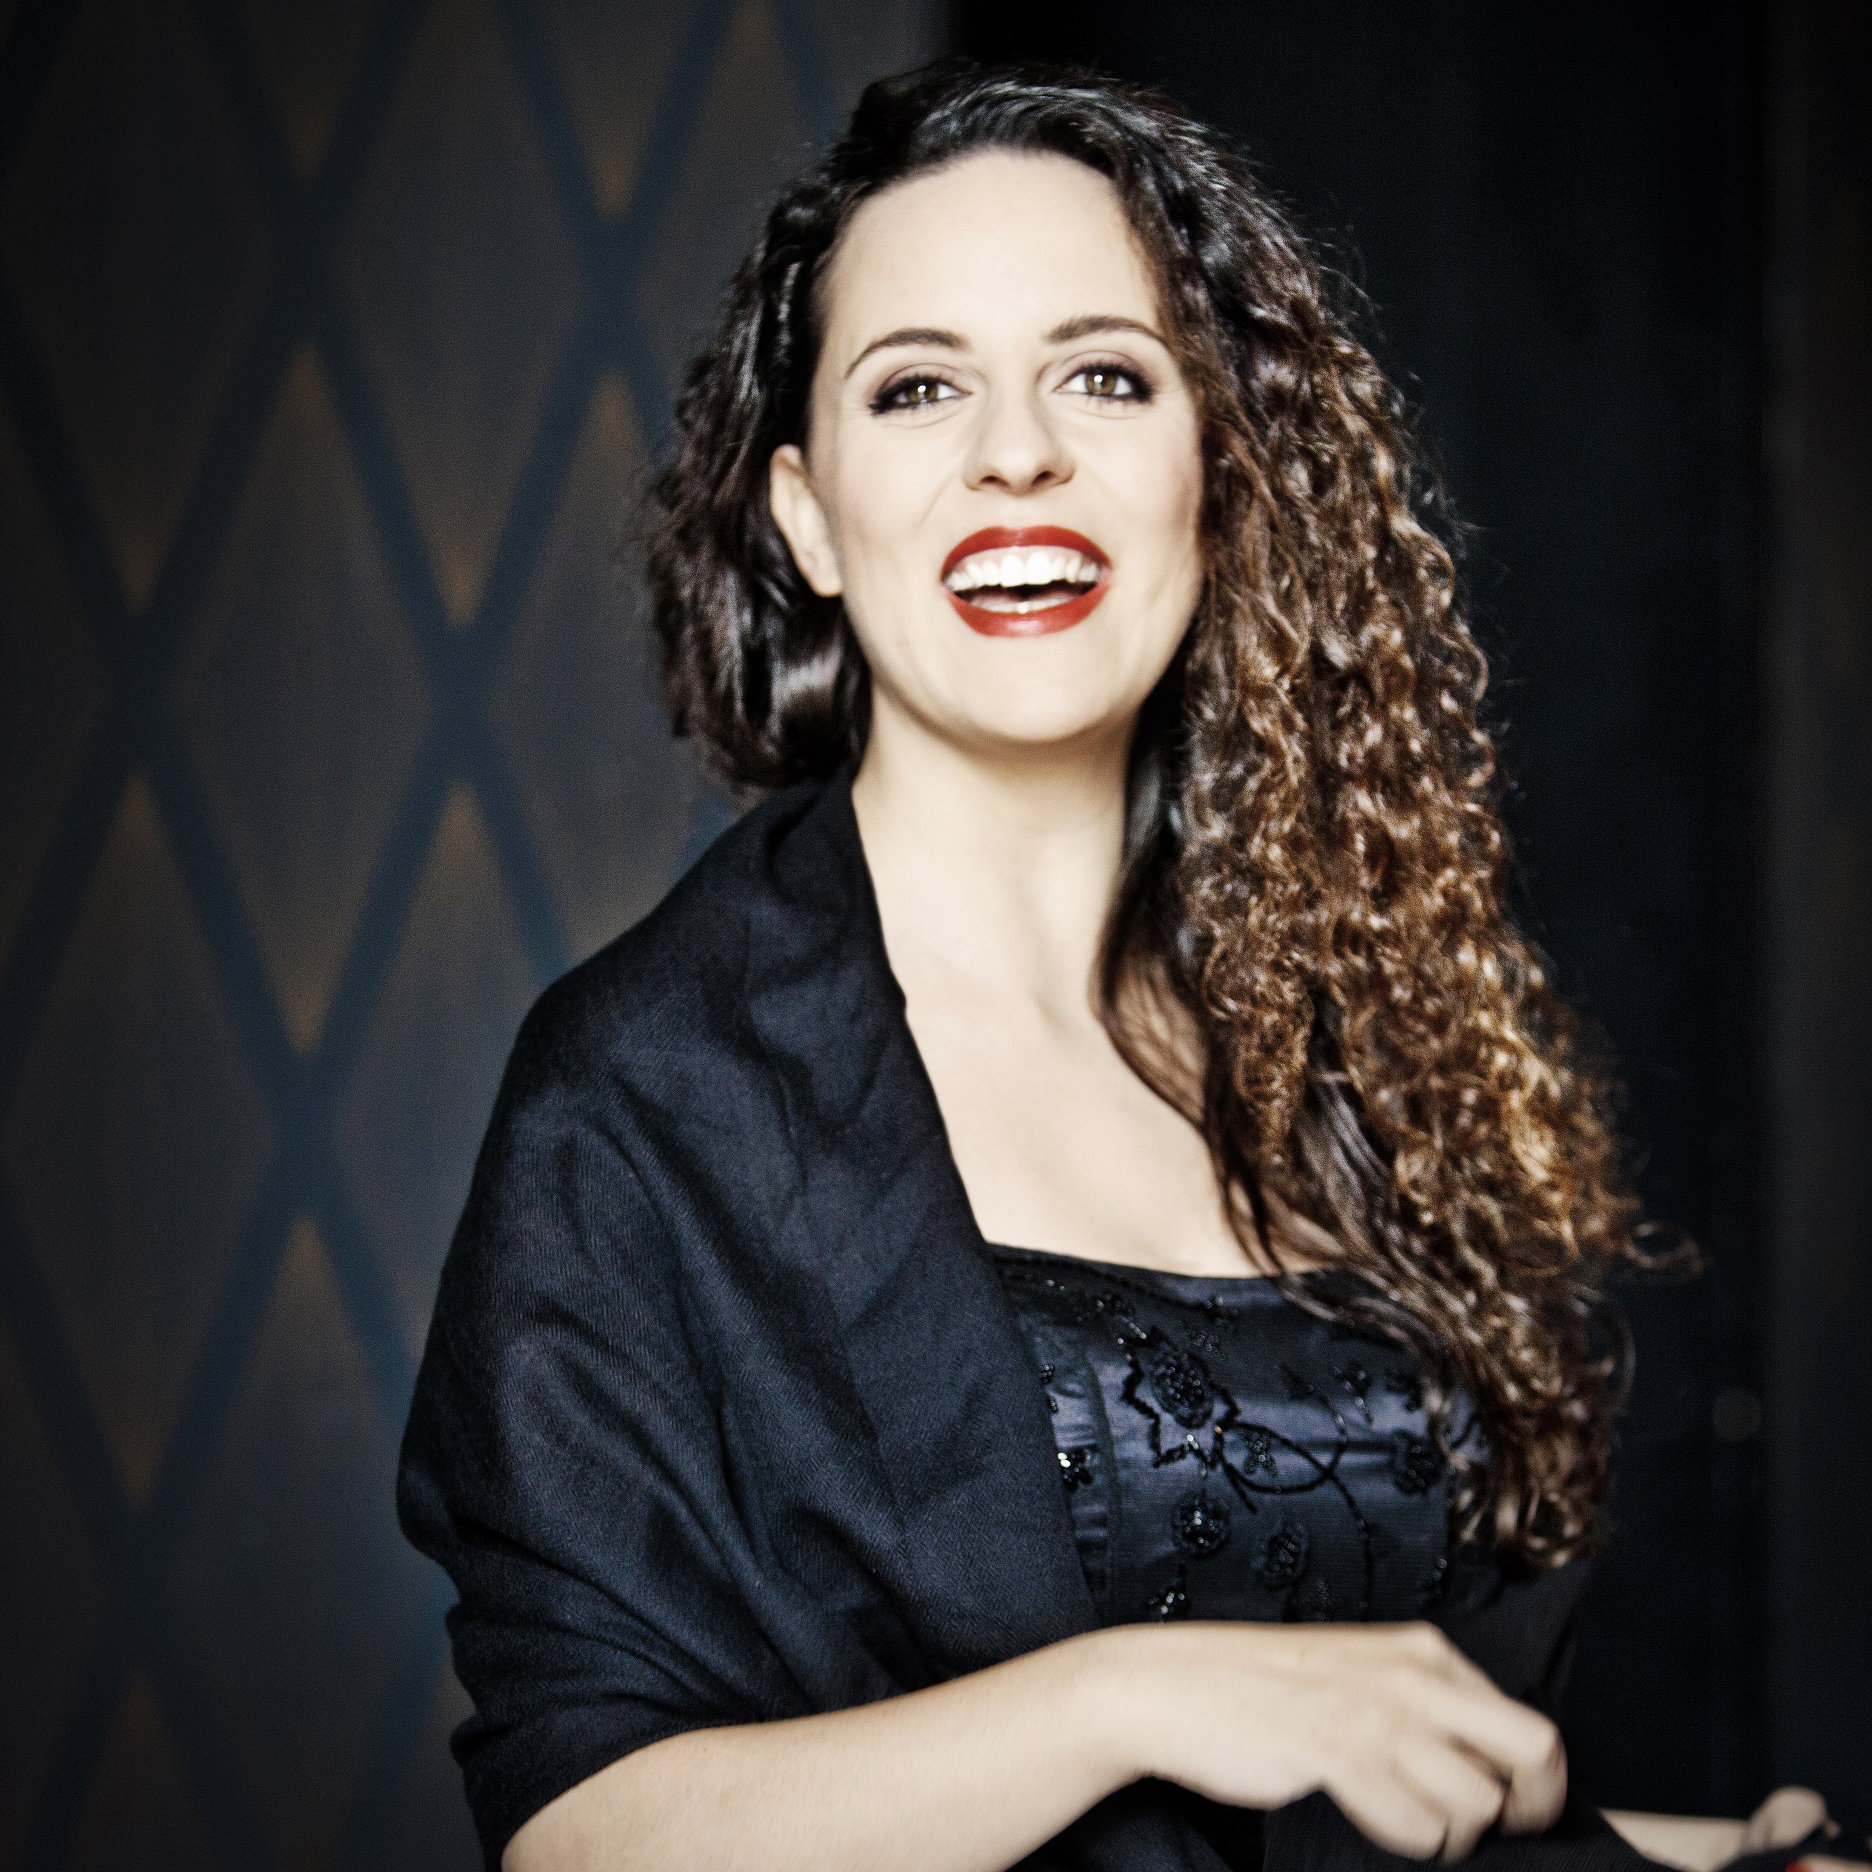 Sonja Catalano (c) Irene Zandel